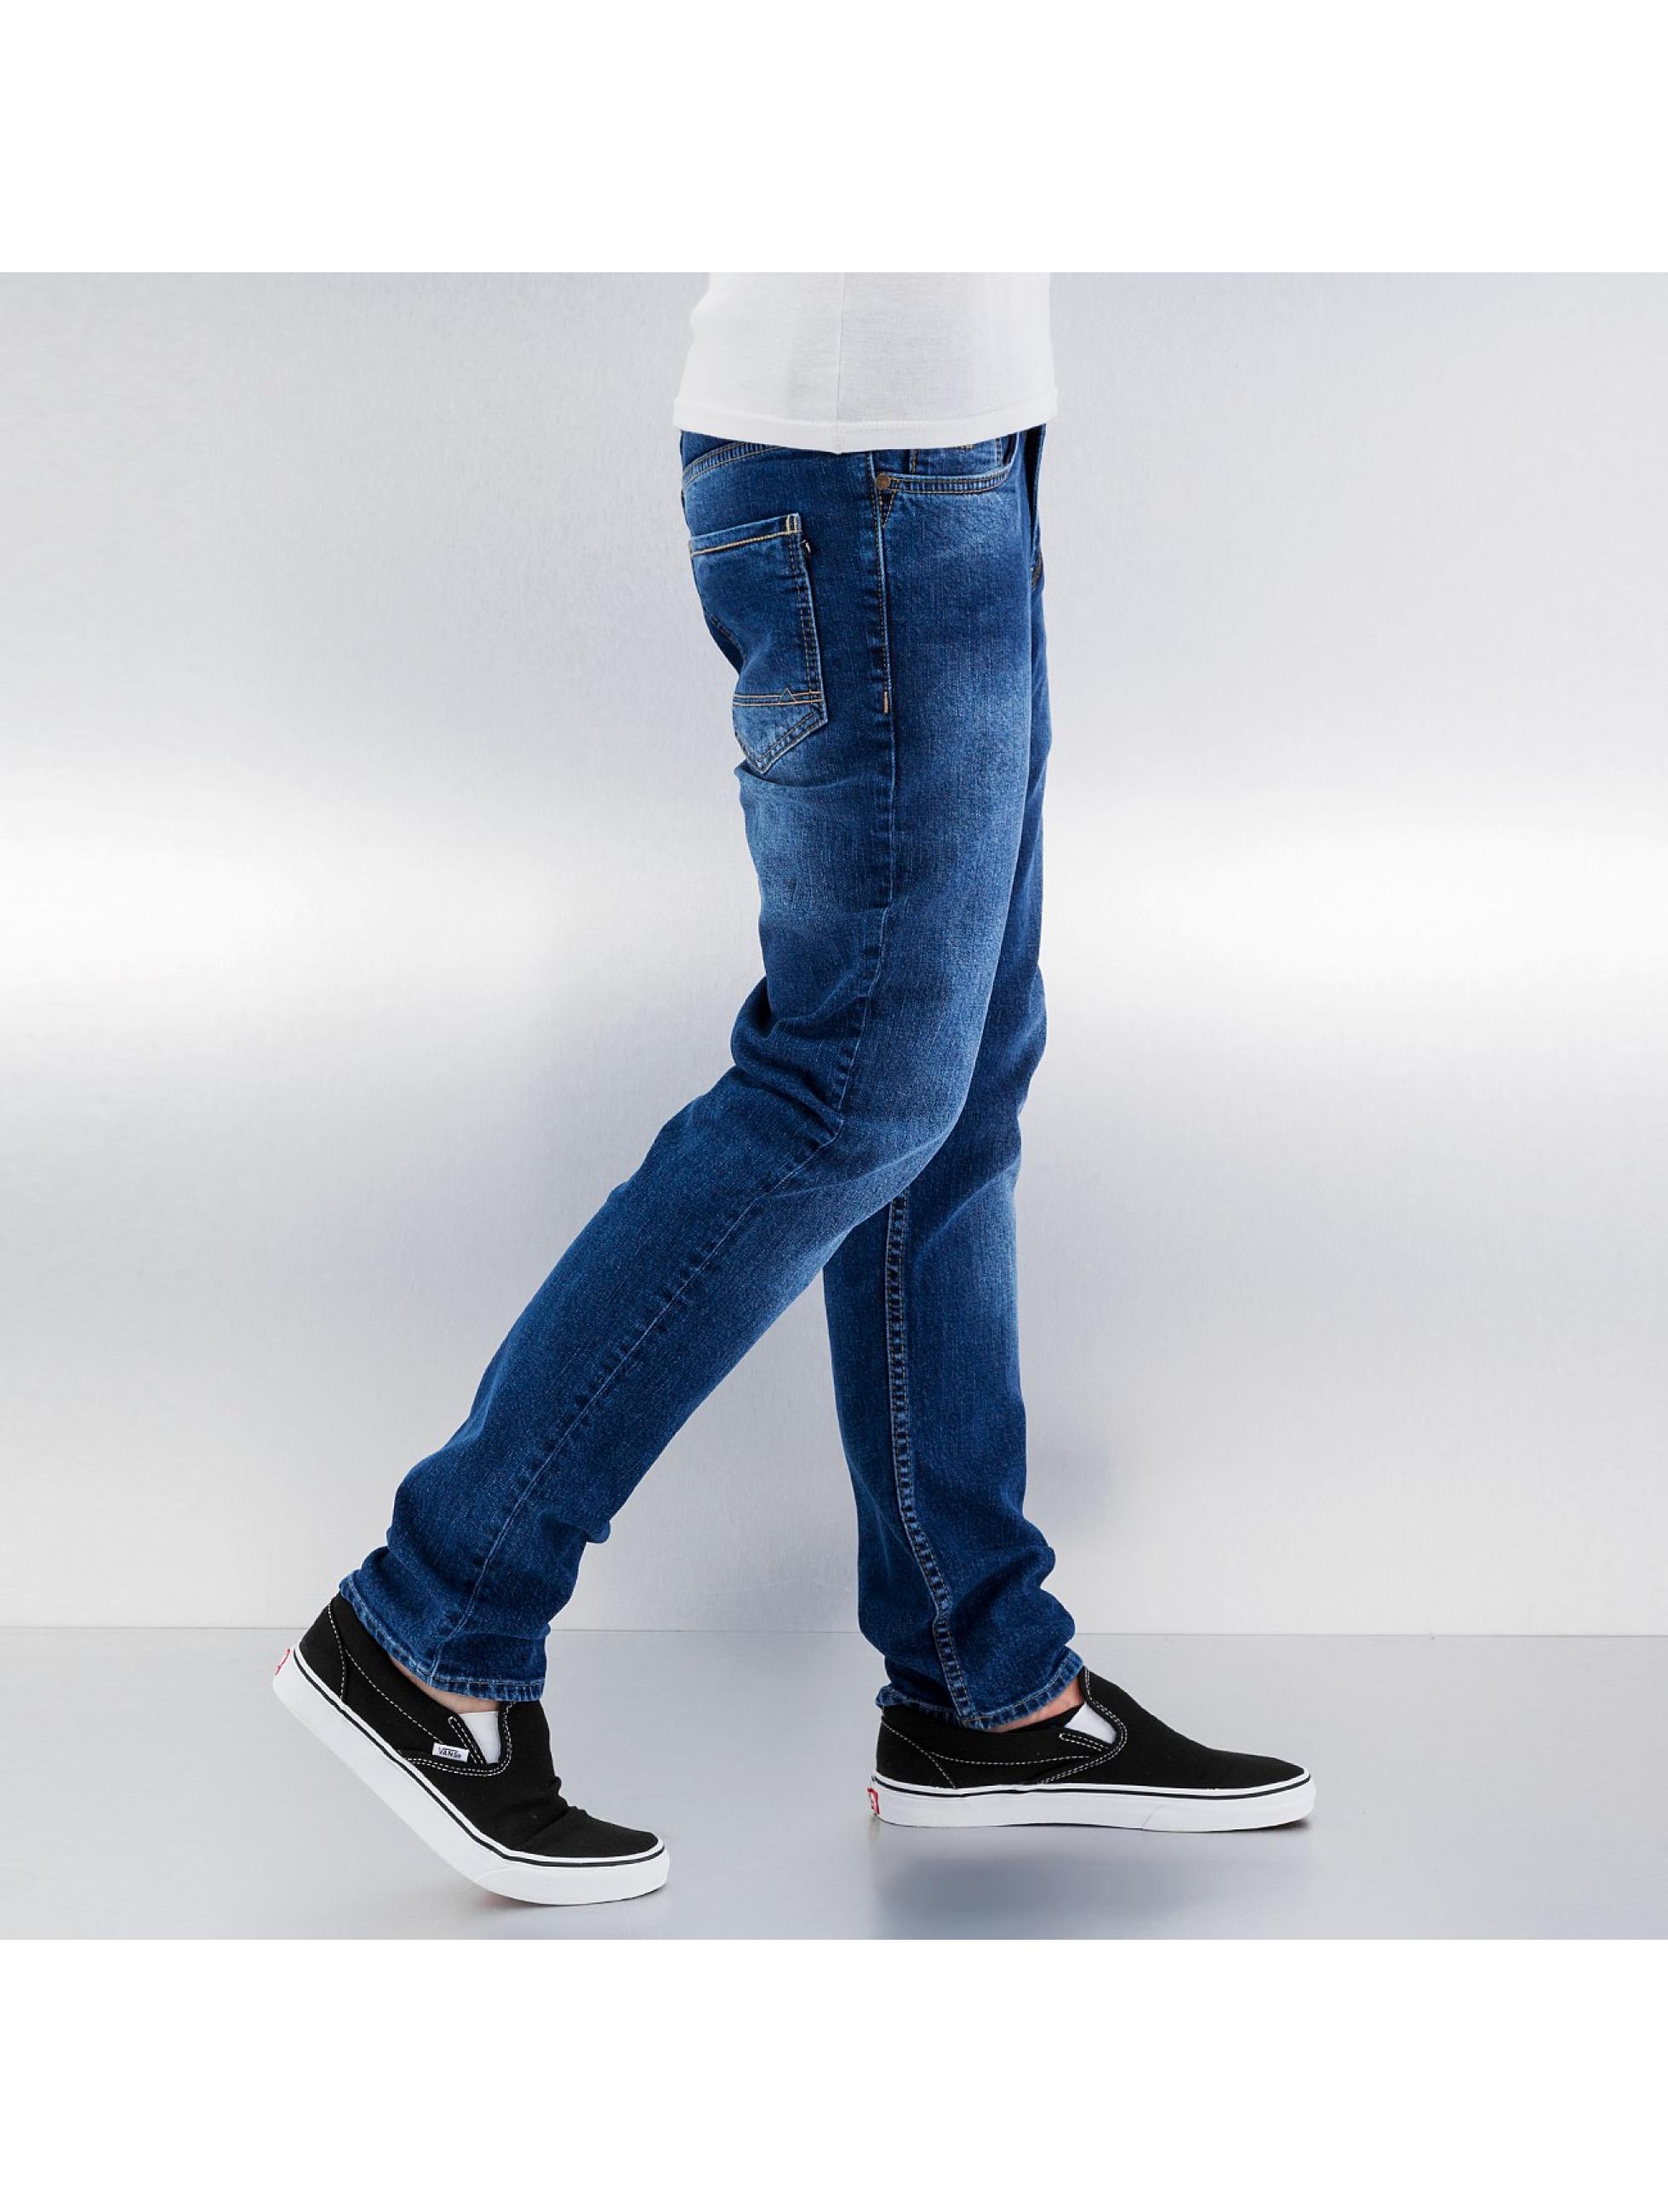 Reell Jeans Slim Fit Jeans Spider blau